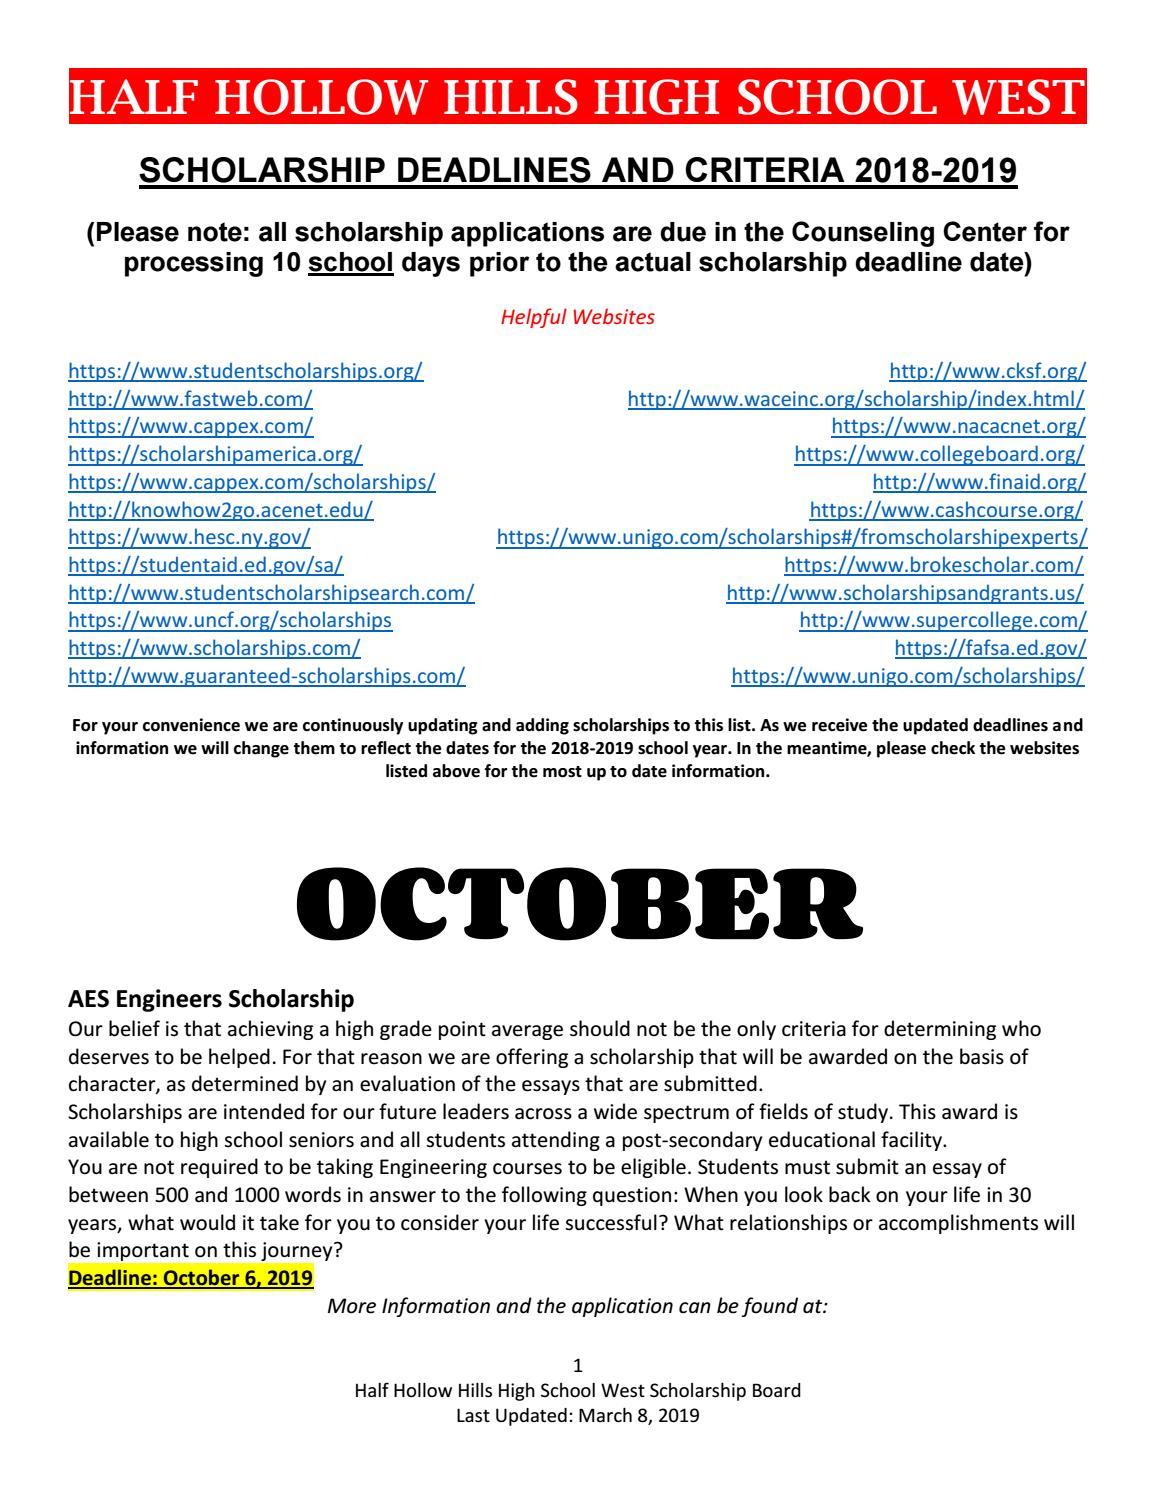 HSW Scholarship Board 3-8-19 by Half Hollow Hills Schools